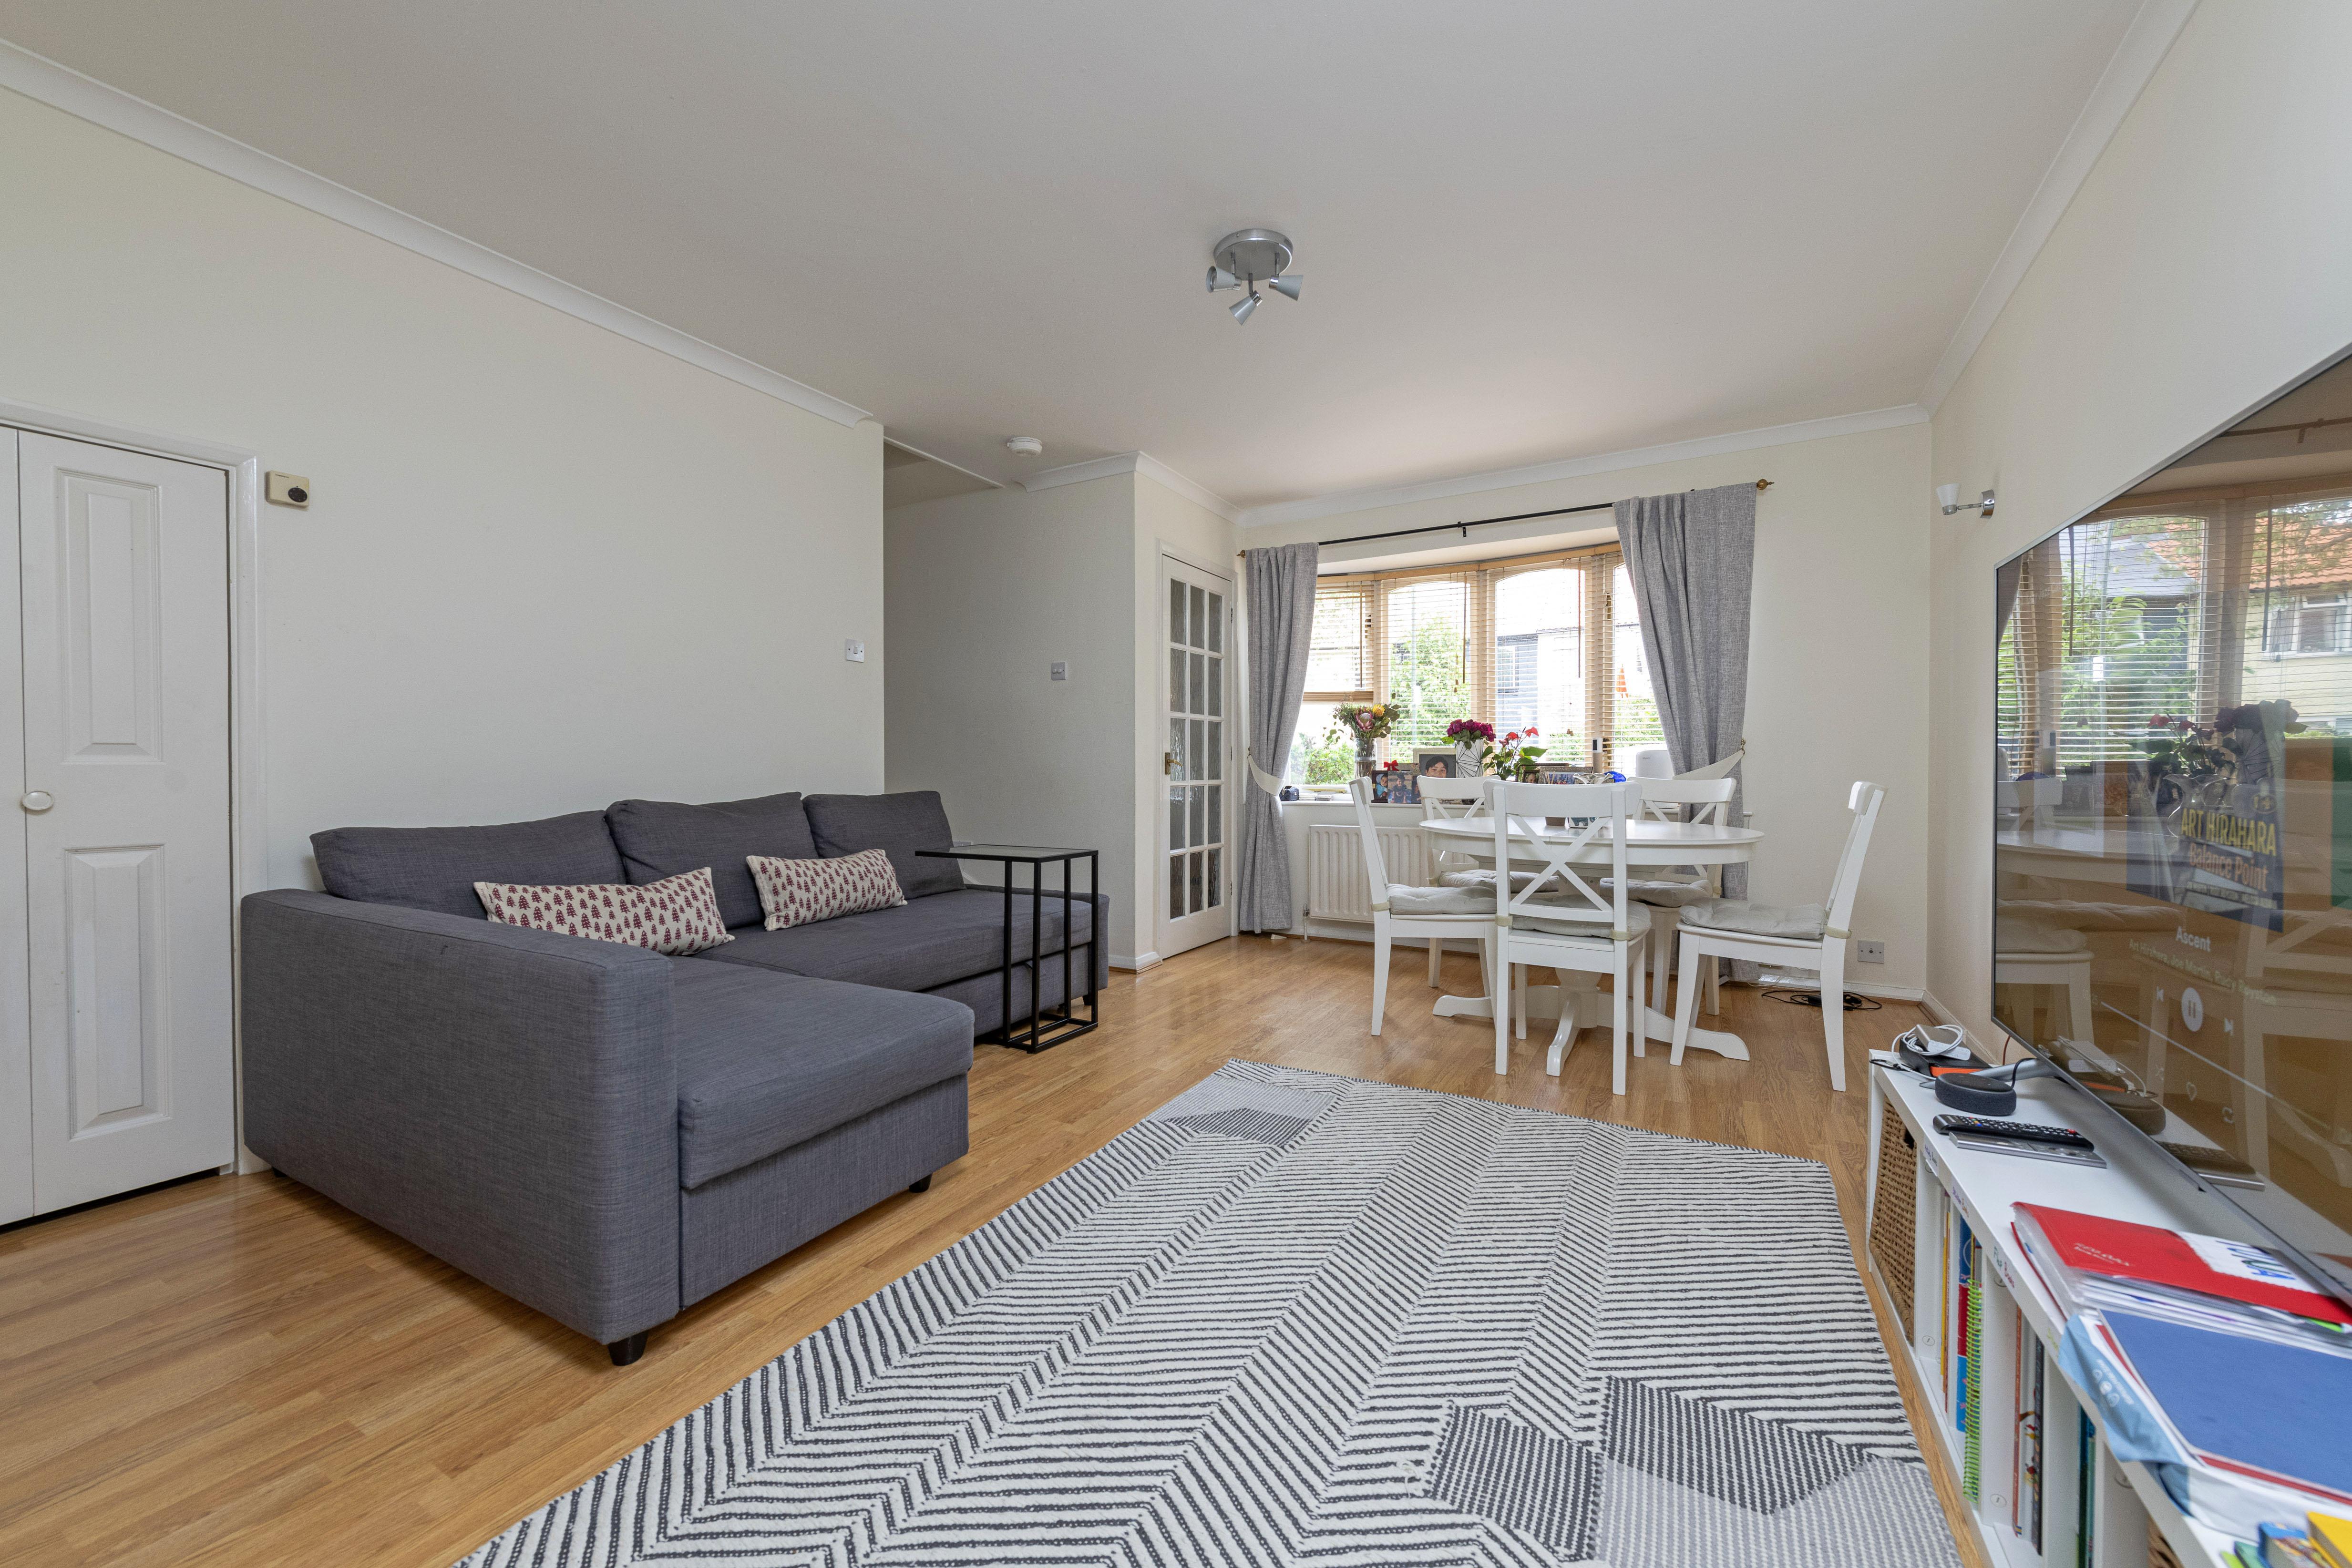 2 bedroom property in Stillingfleet Road, Barnes, SW13 9AG ...